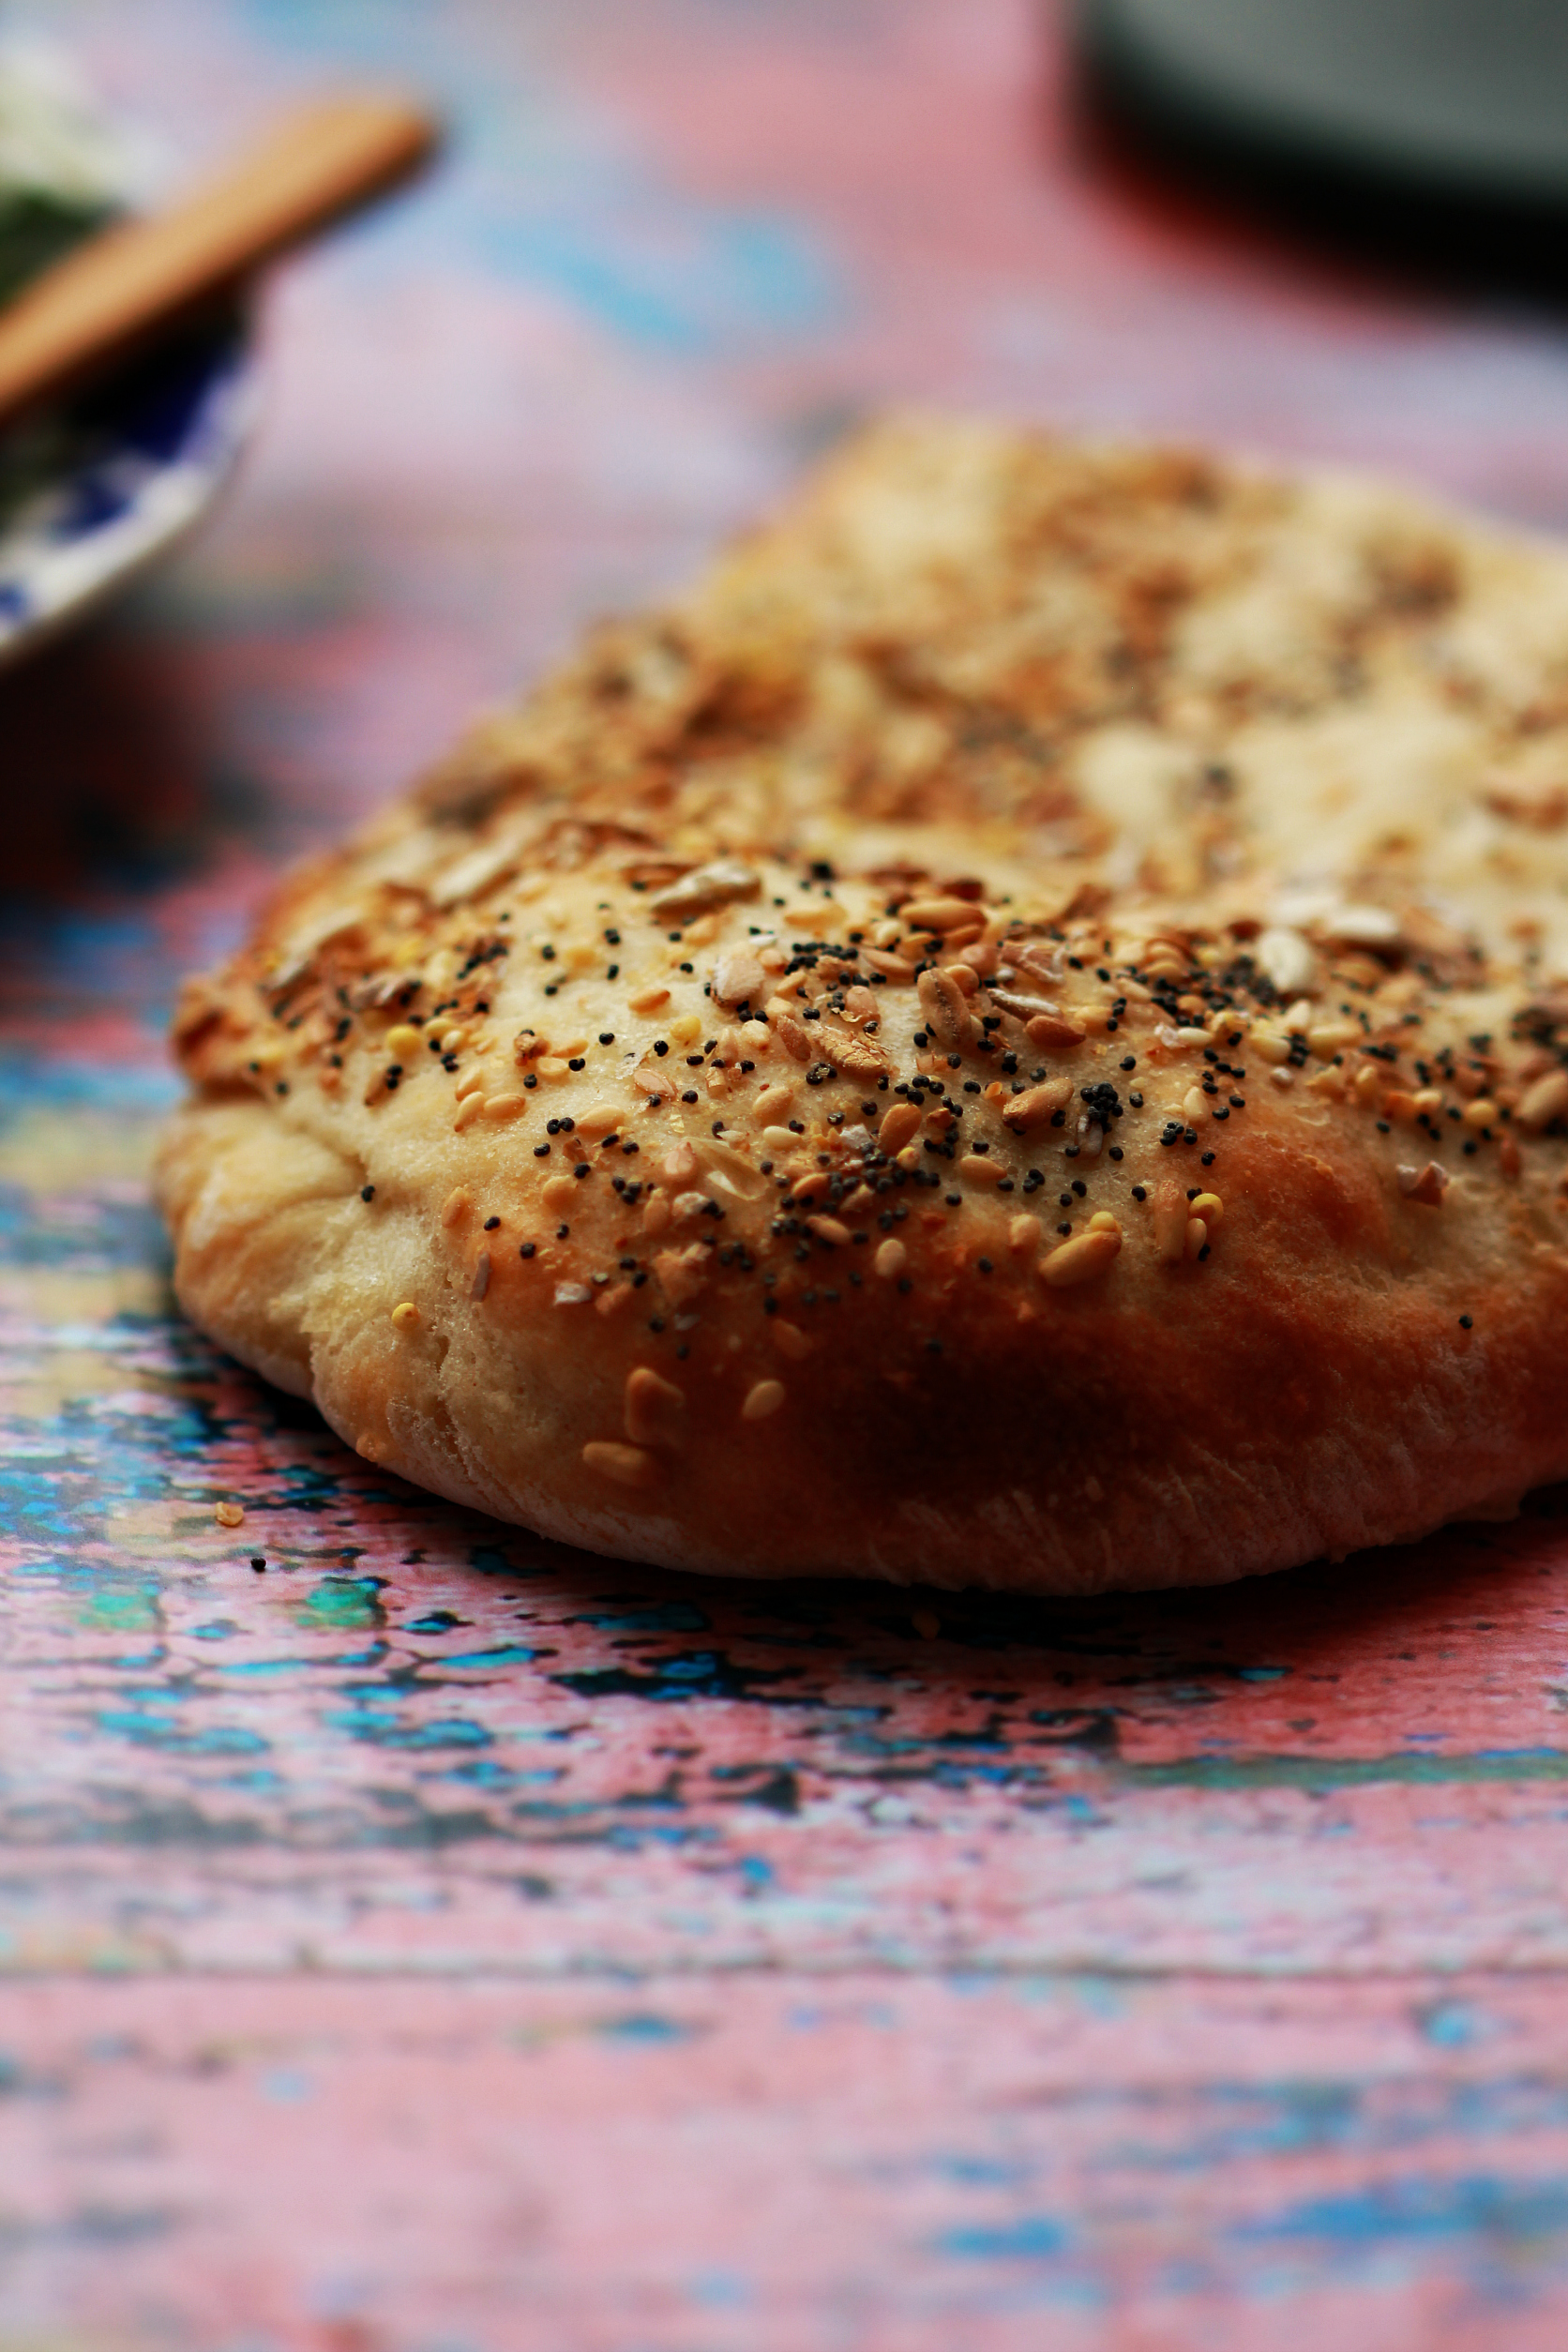 Half Loaf, Iranian Flatbread by Dena T Bray